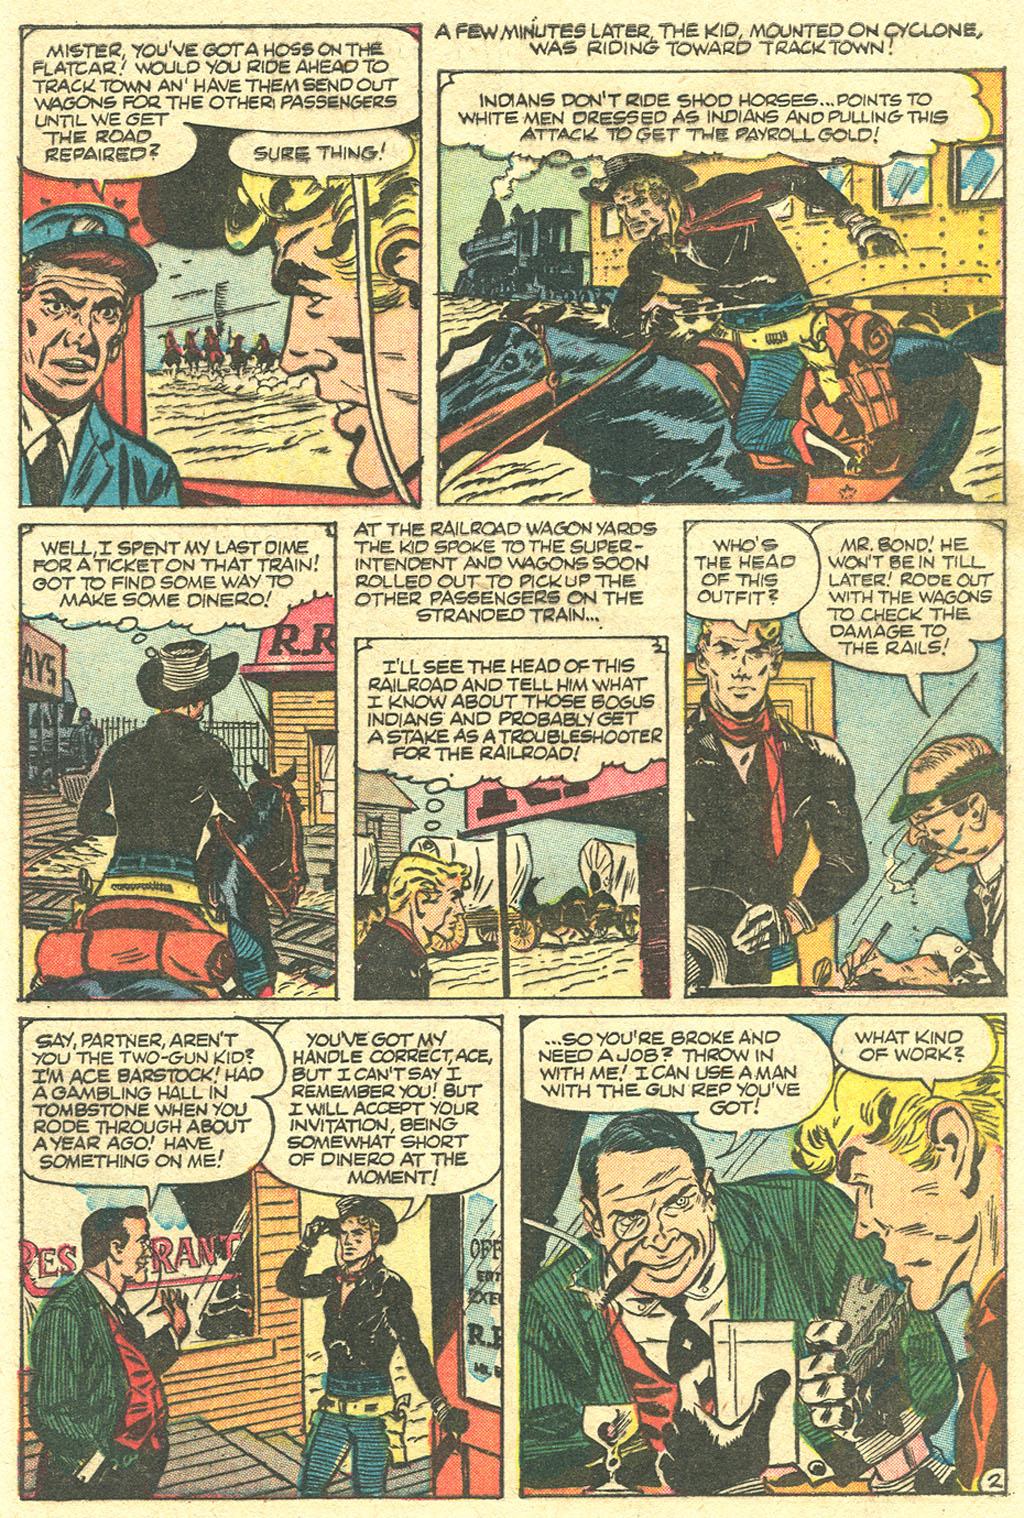 Read online Two-Gun Kid comic -  Issue #32 - 29